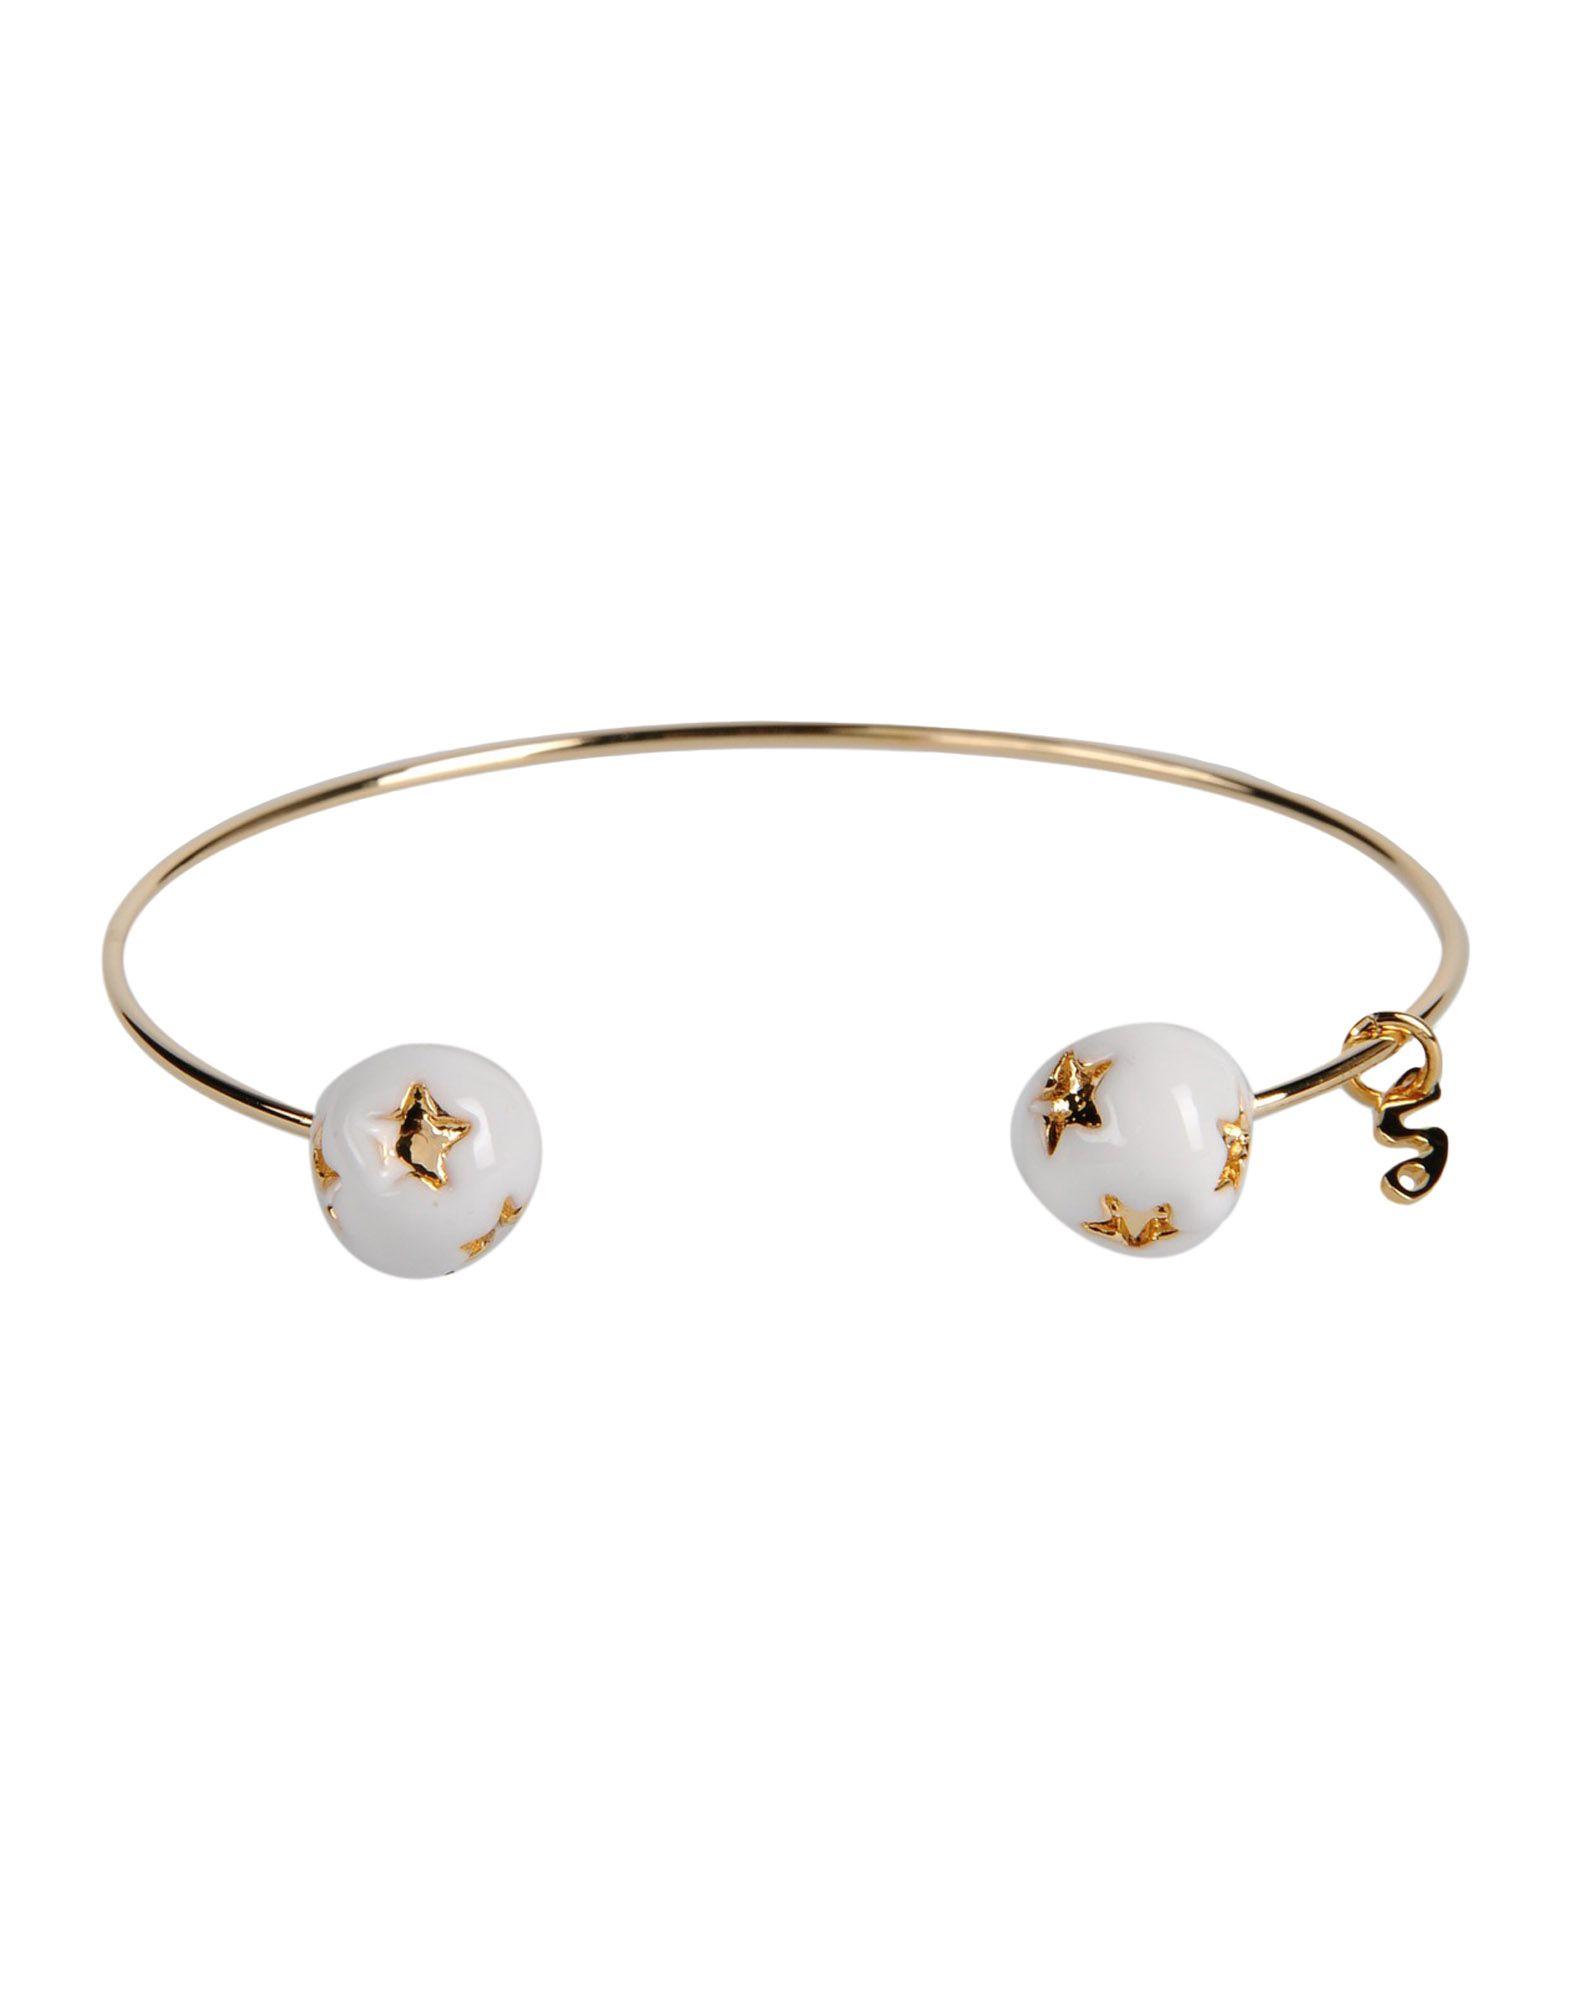 Lanvin JEWELRY - Bracelets su YOOX.COM wPYOc